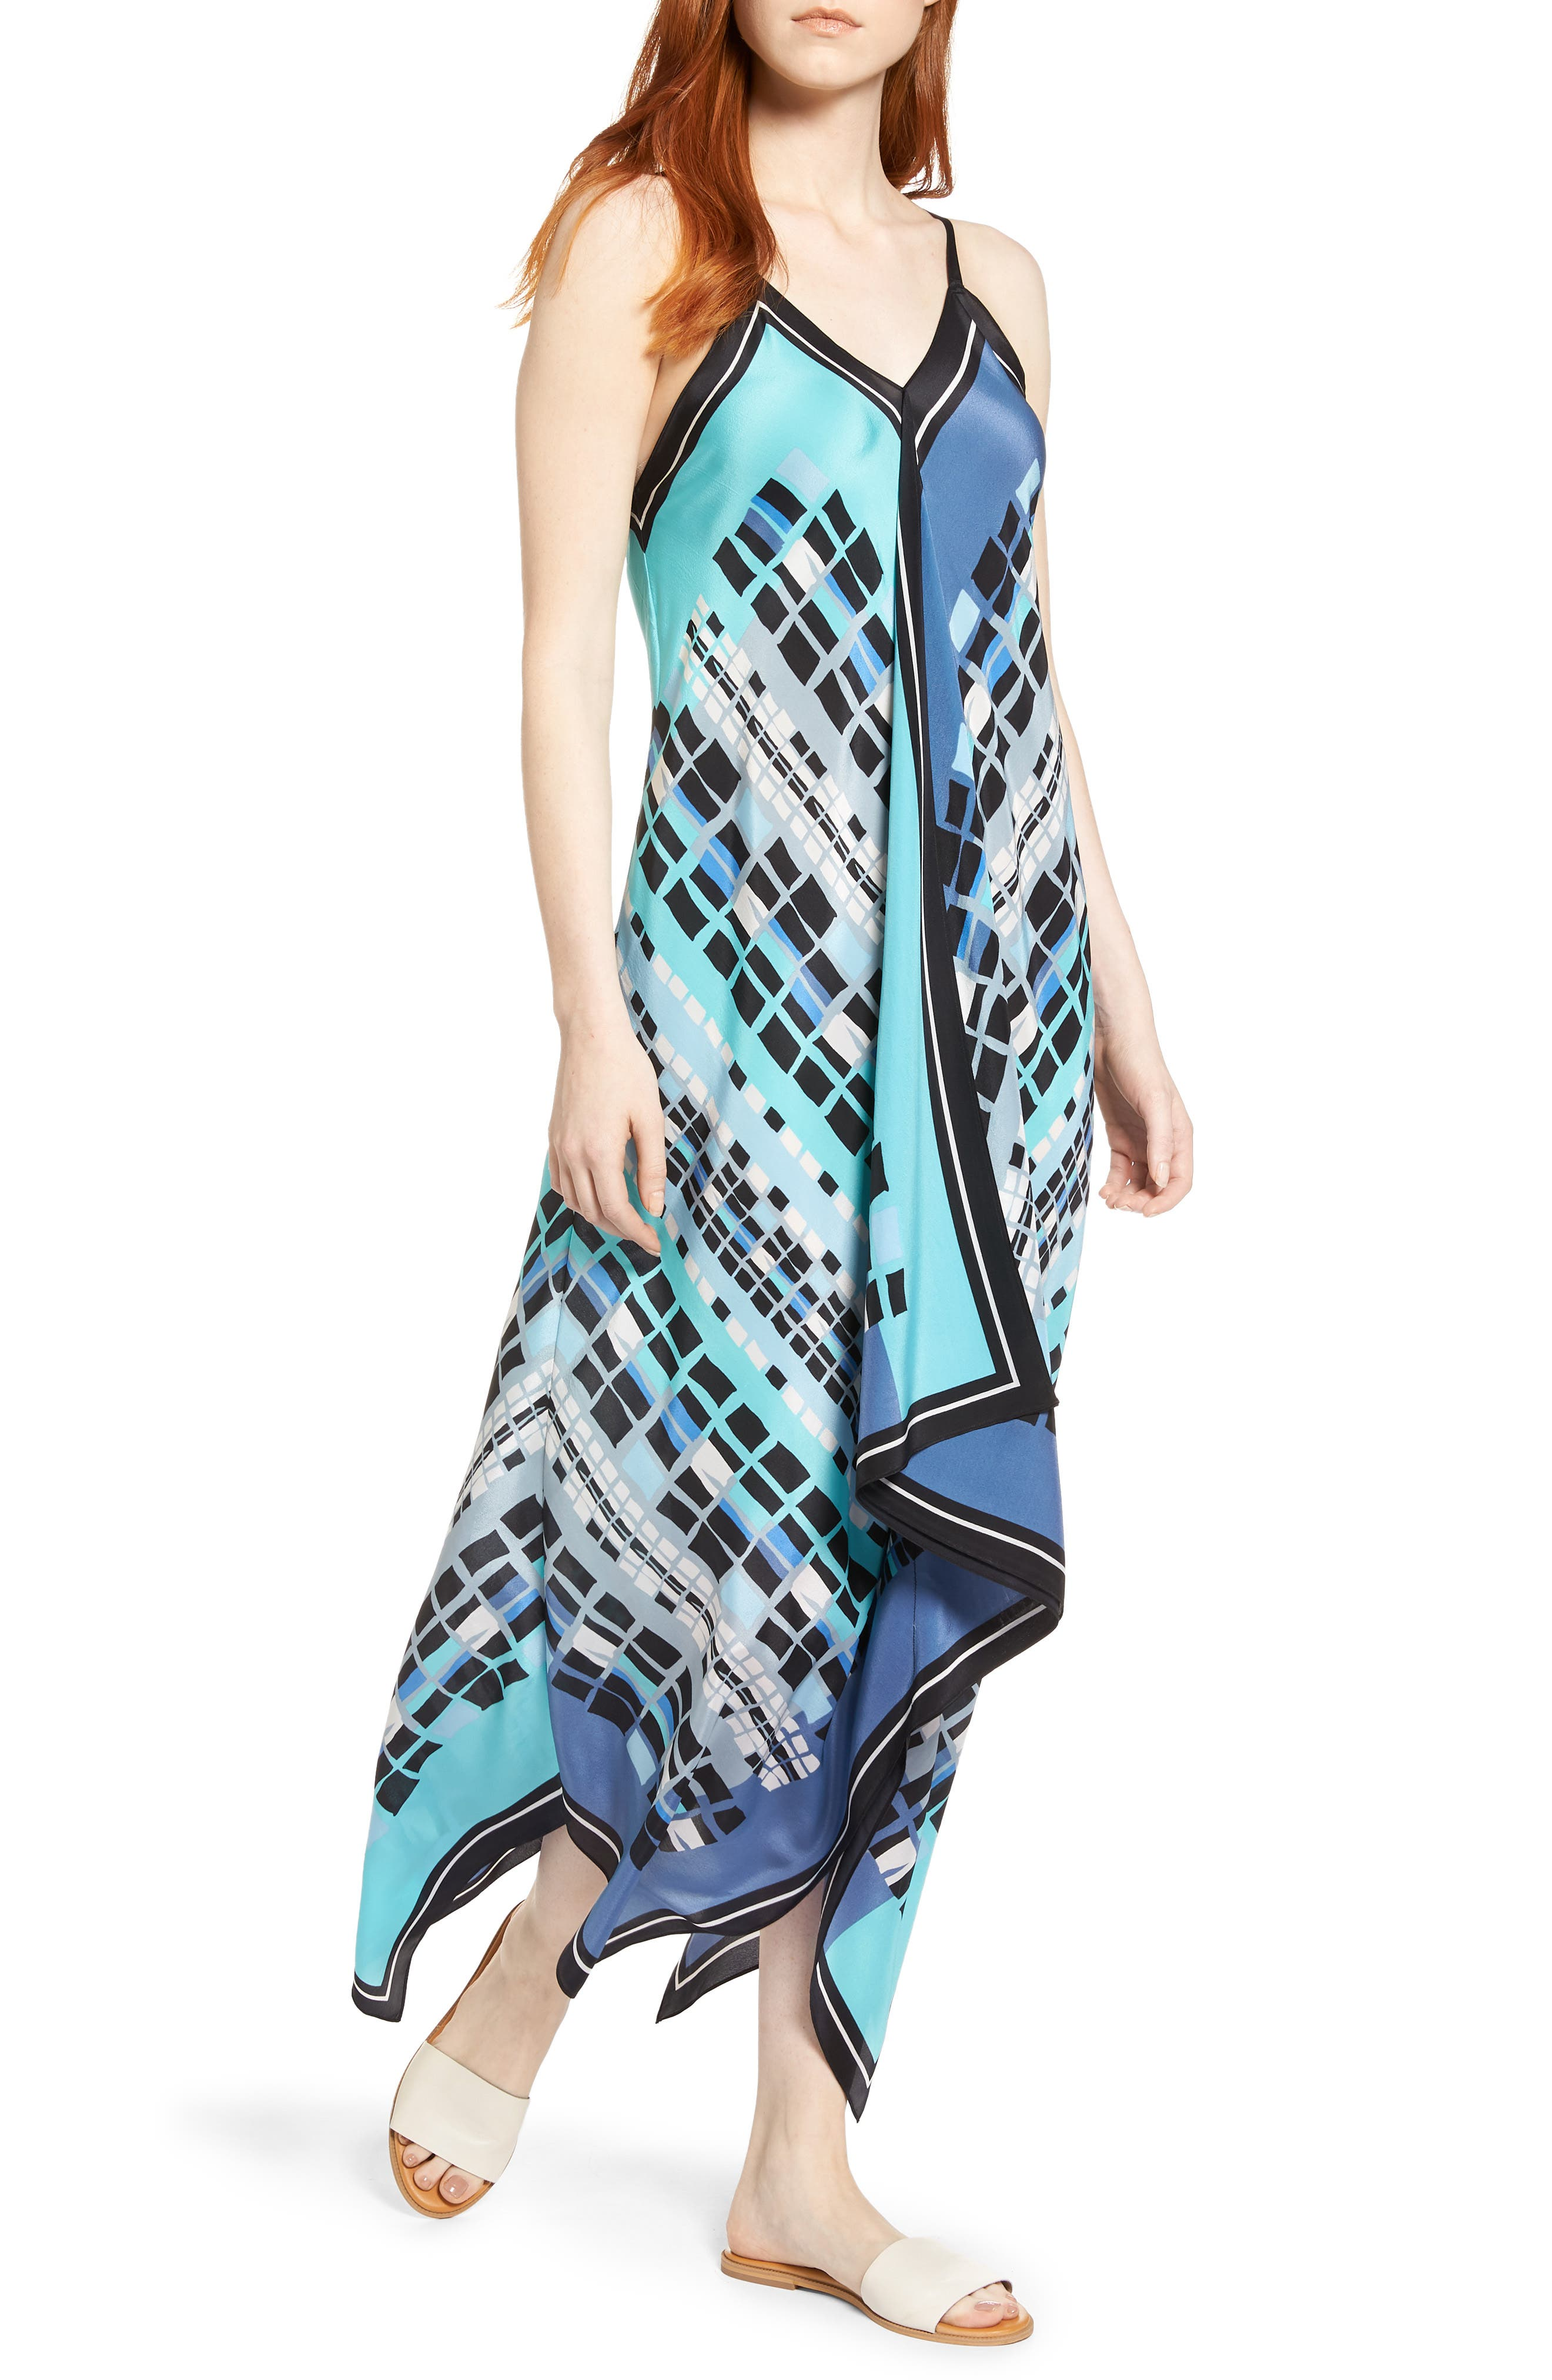 Main Image - NIC+ZOE From Above Dress Silk Blend Maxi Dress (Regular & Petite)